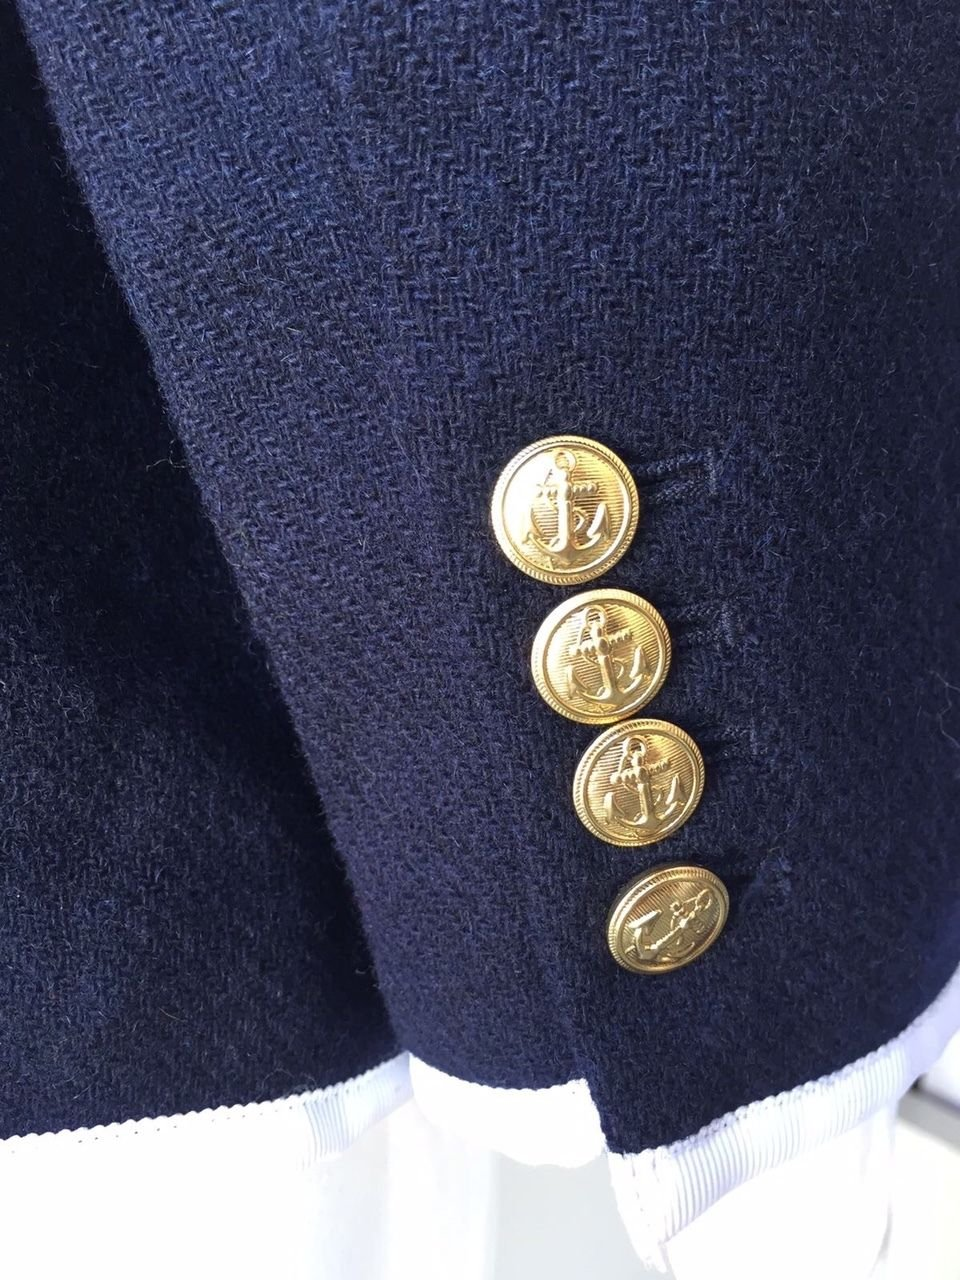 Thom Browne for Neiman Marcus + Target Navy Wool Blazer Size Medium by Thom Browne (Image #7)